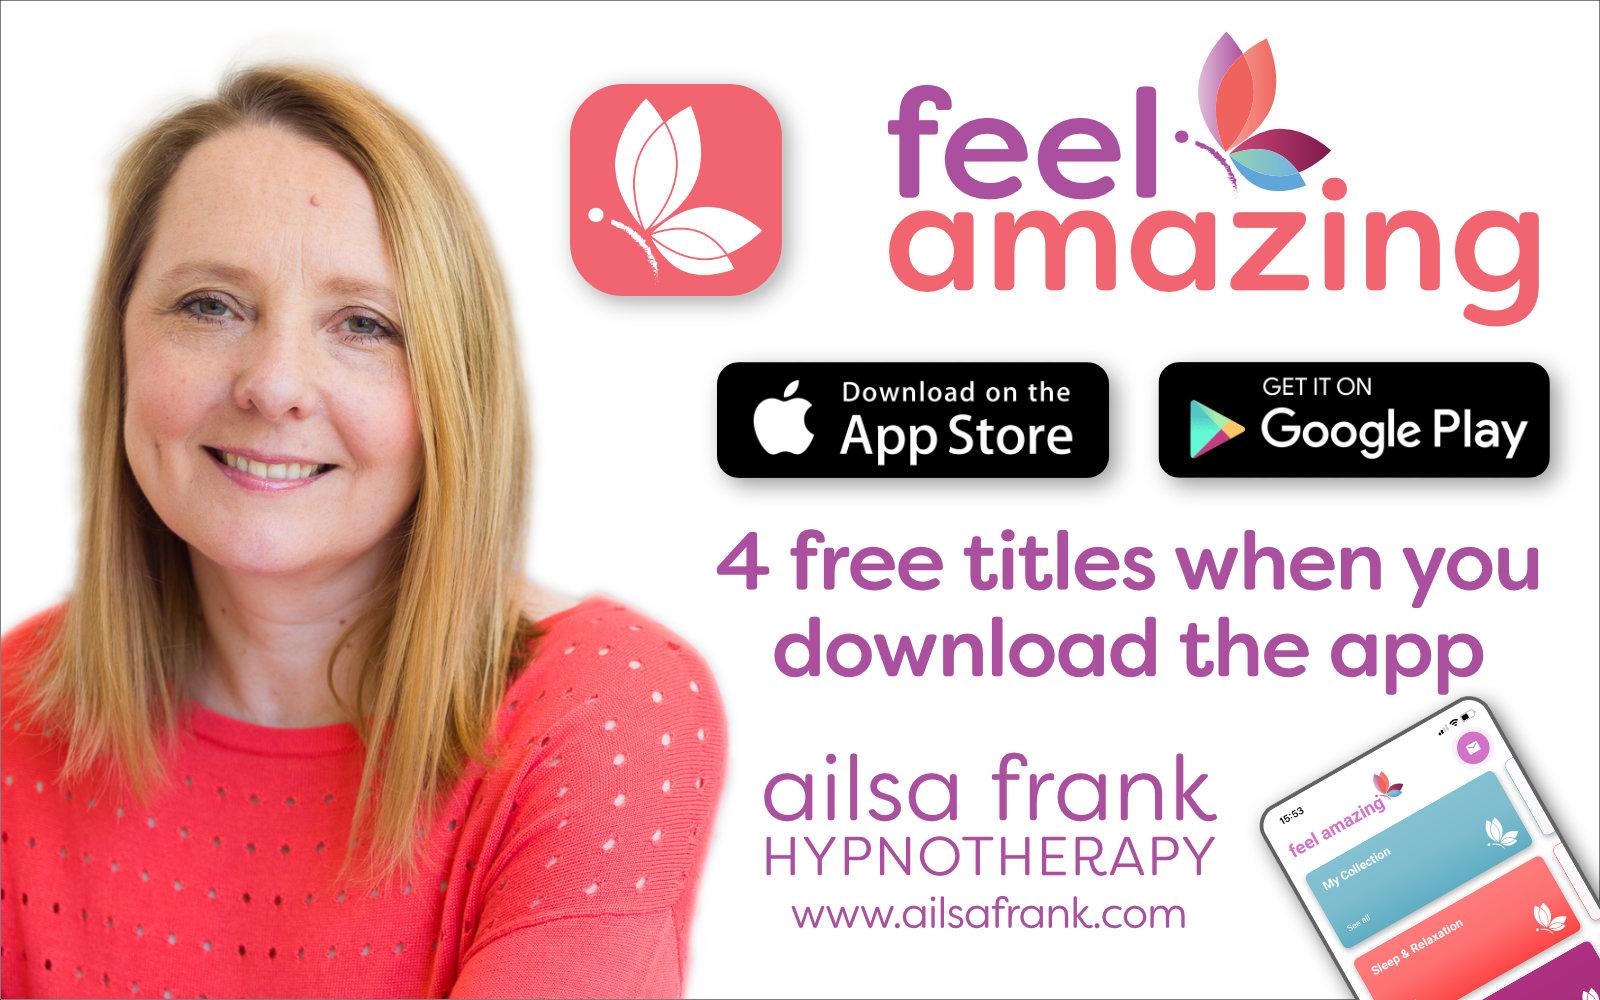 Feel Amazing by Ailsa Frank